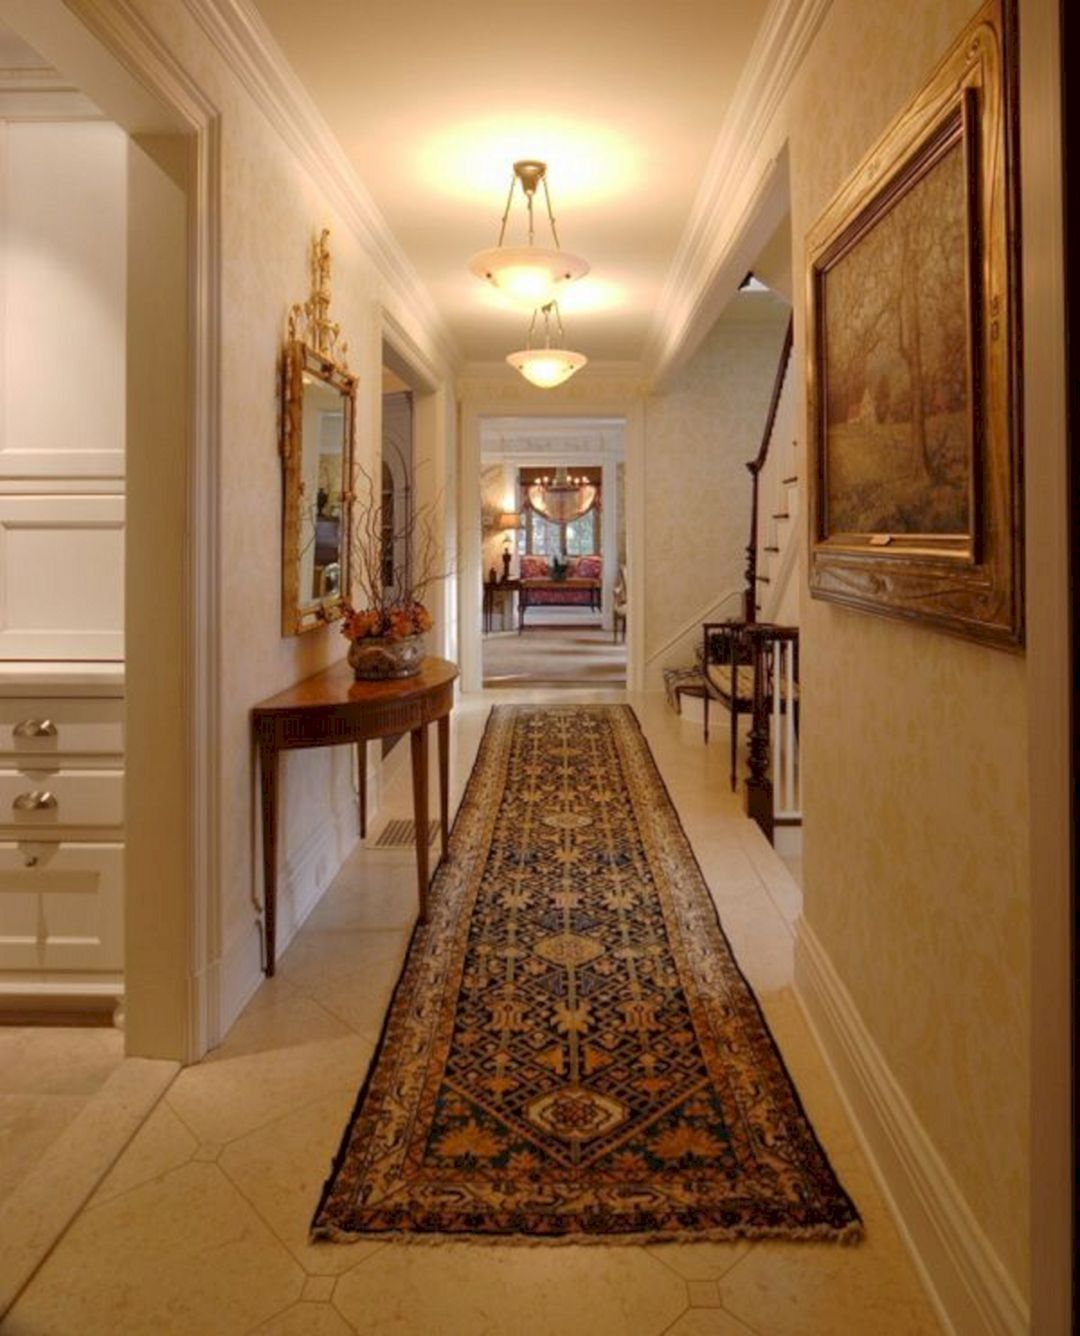 Home Interior Design Ideas Hall: 20+ Marvelous Home Corridor Design Ideas That Looks Modern